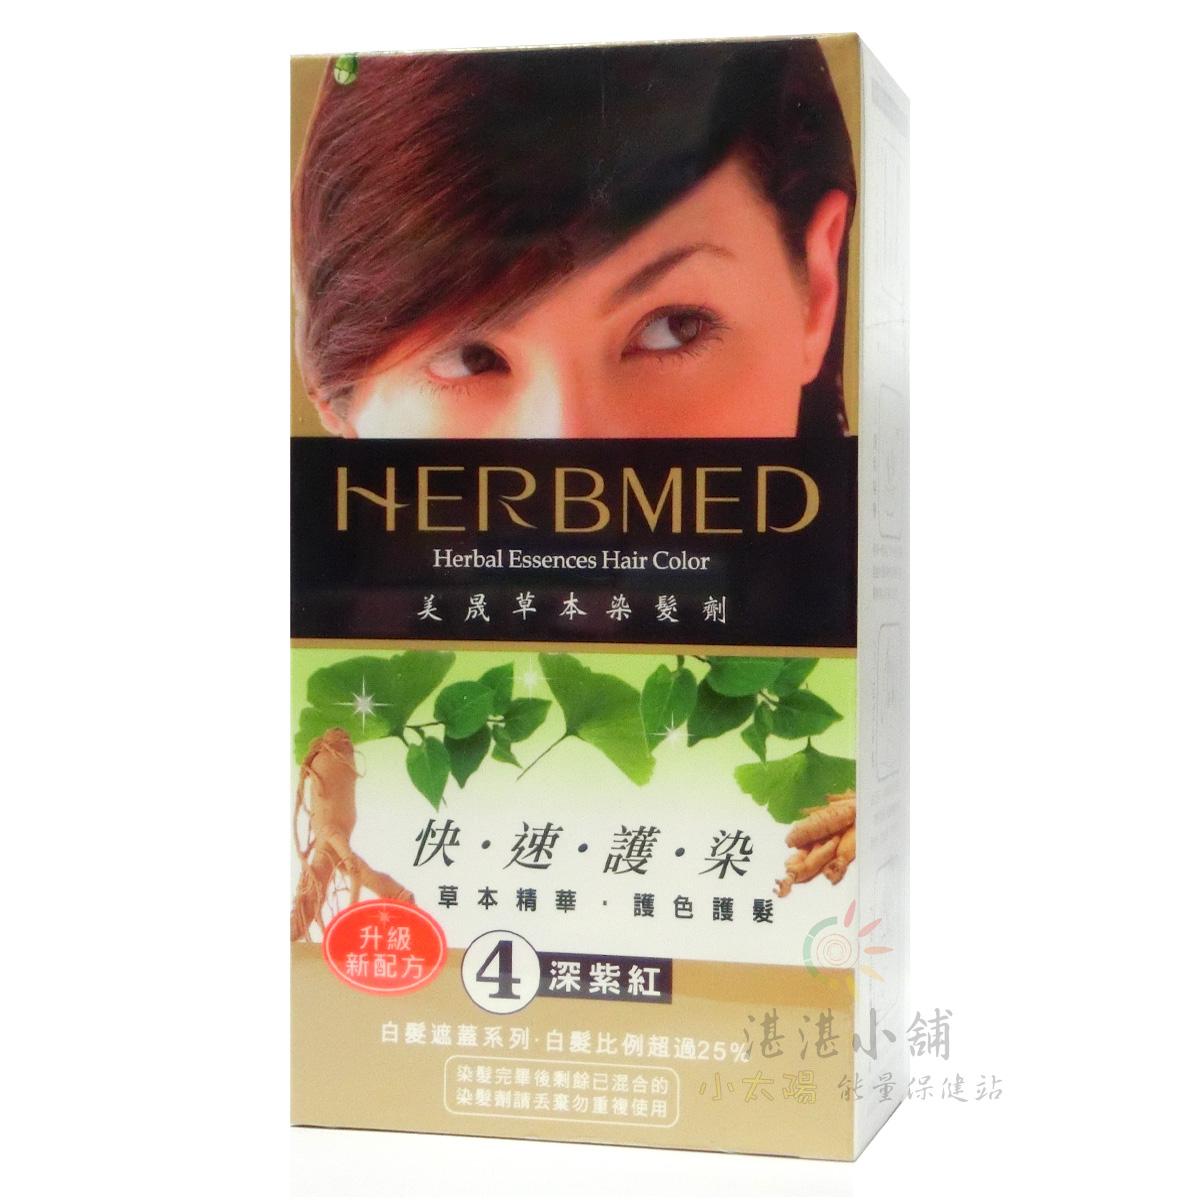 HERBMED 美晟草本染髮劑 快速護染    04 深紫紅